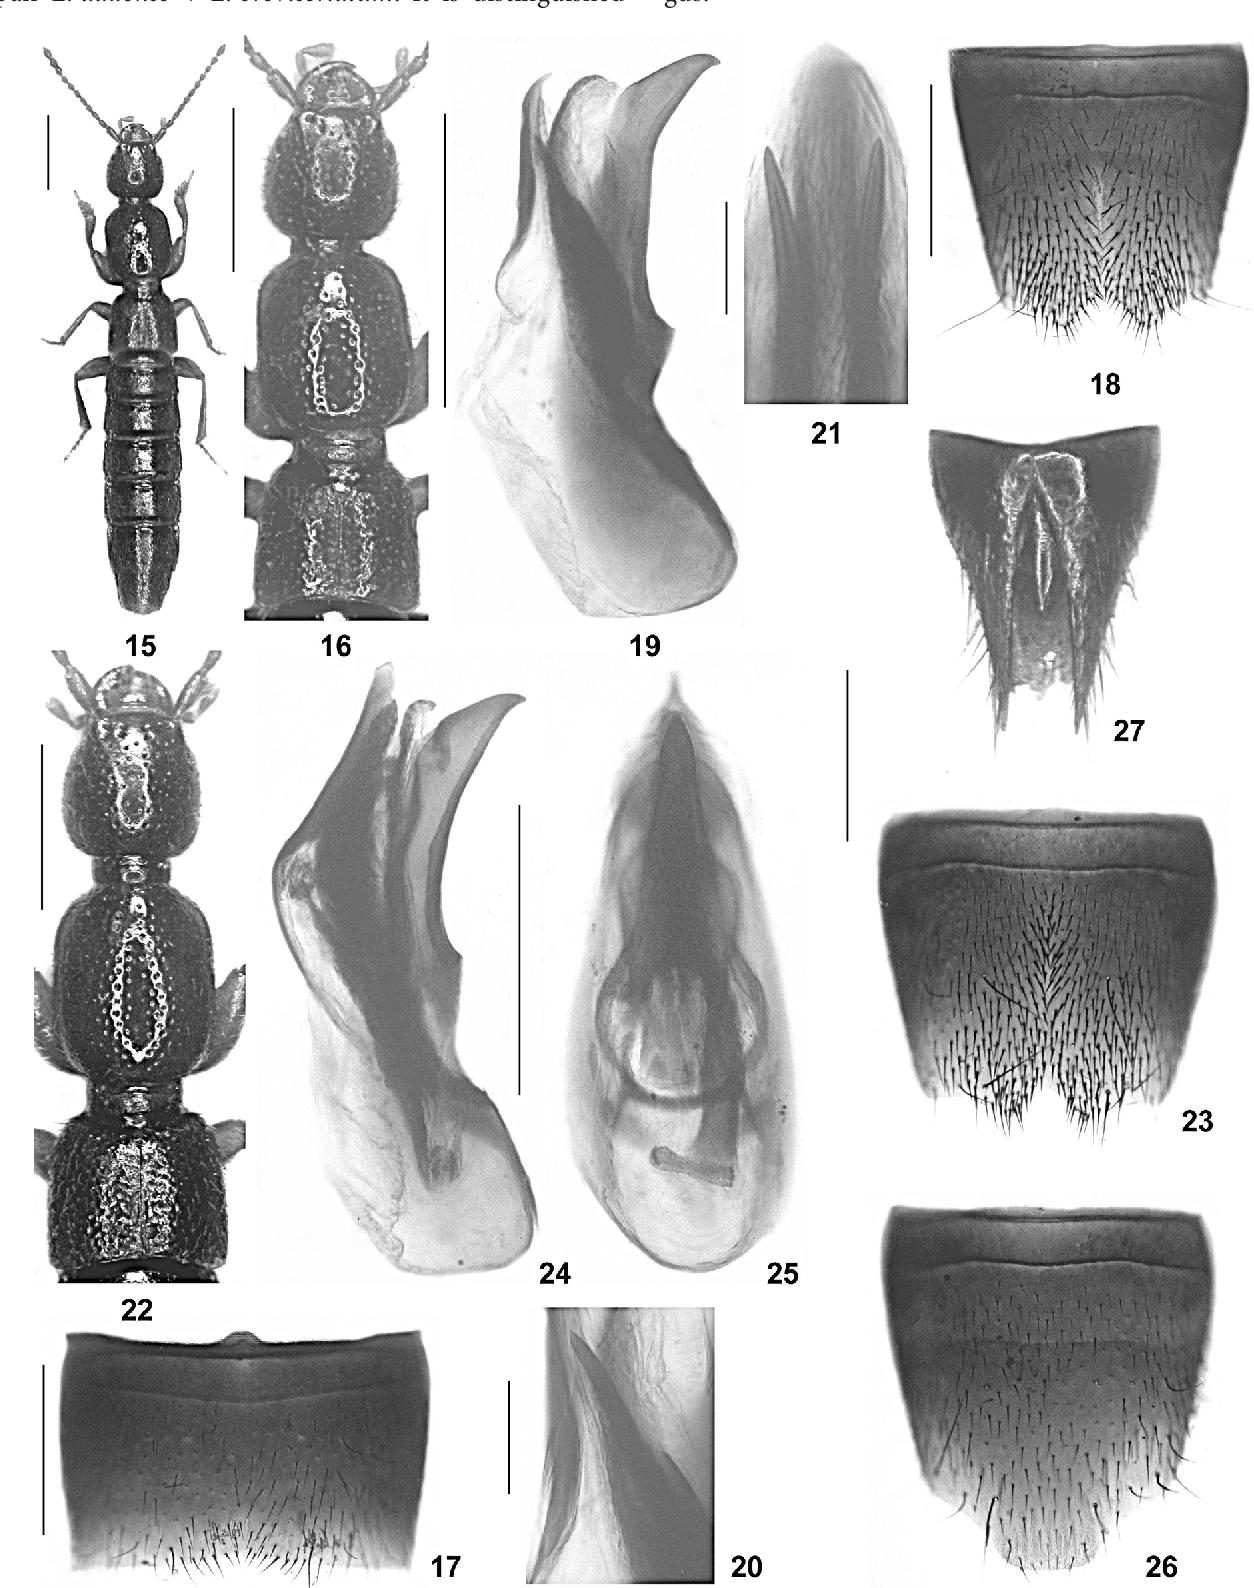 figure 15-27